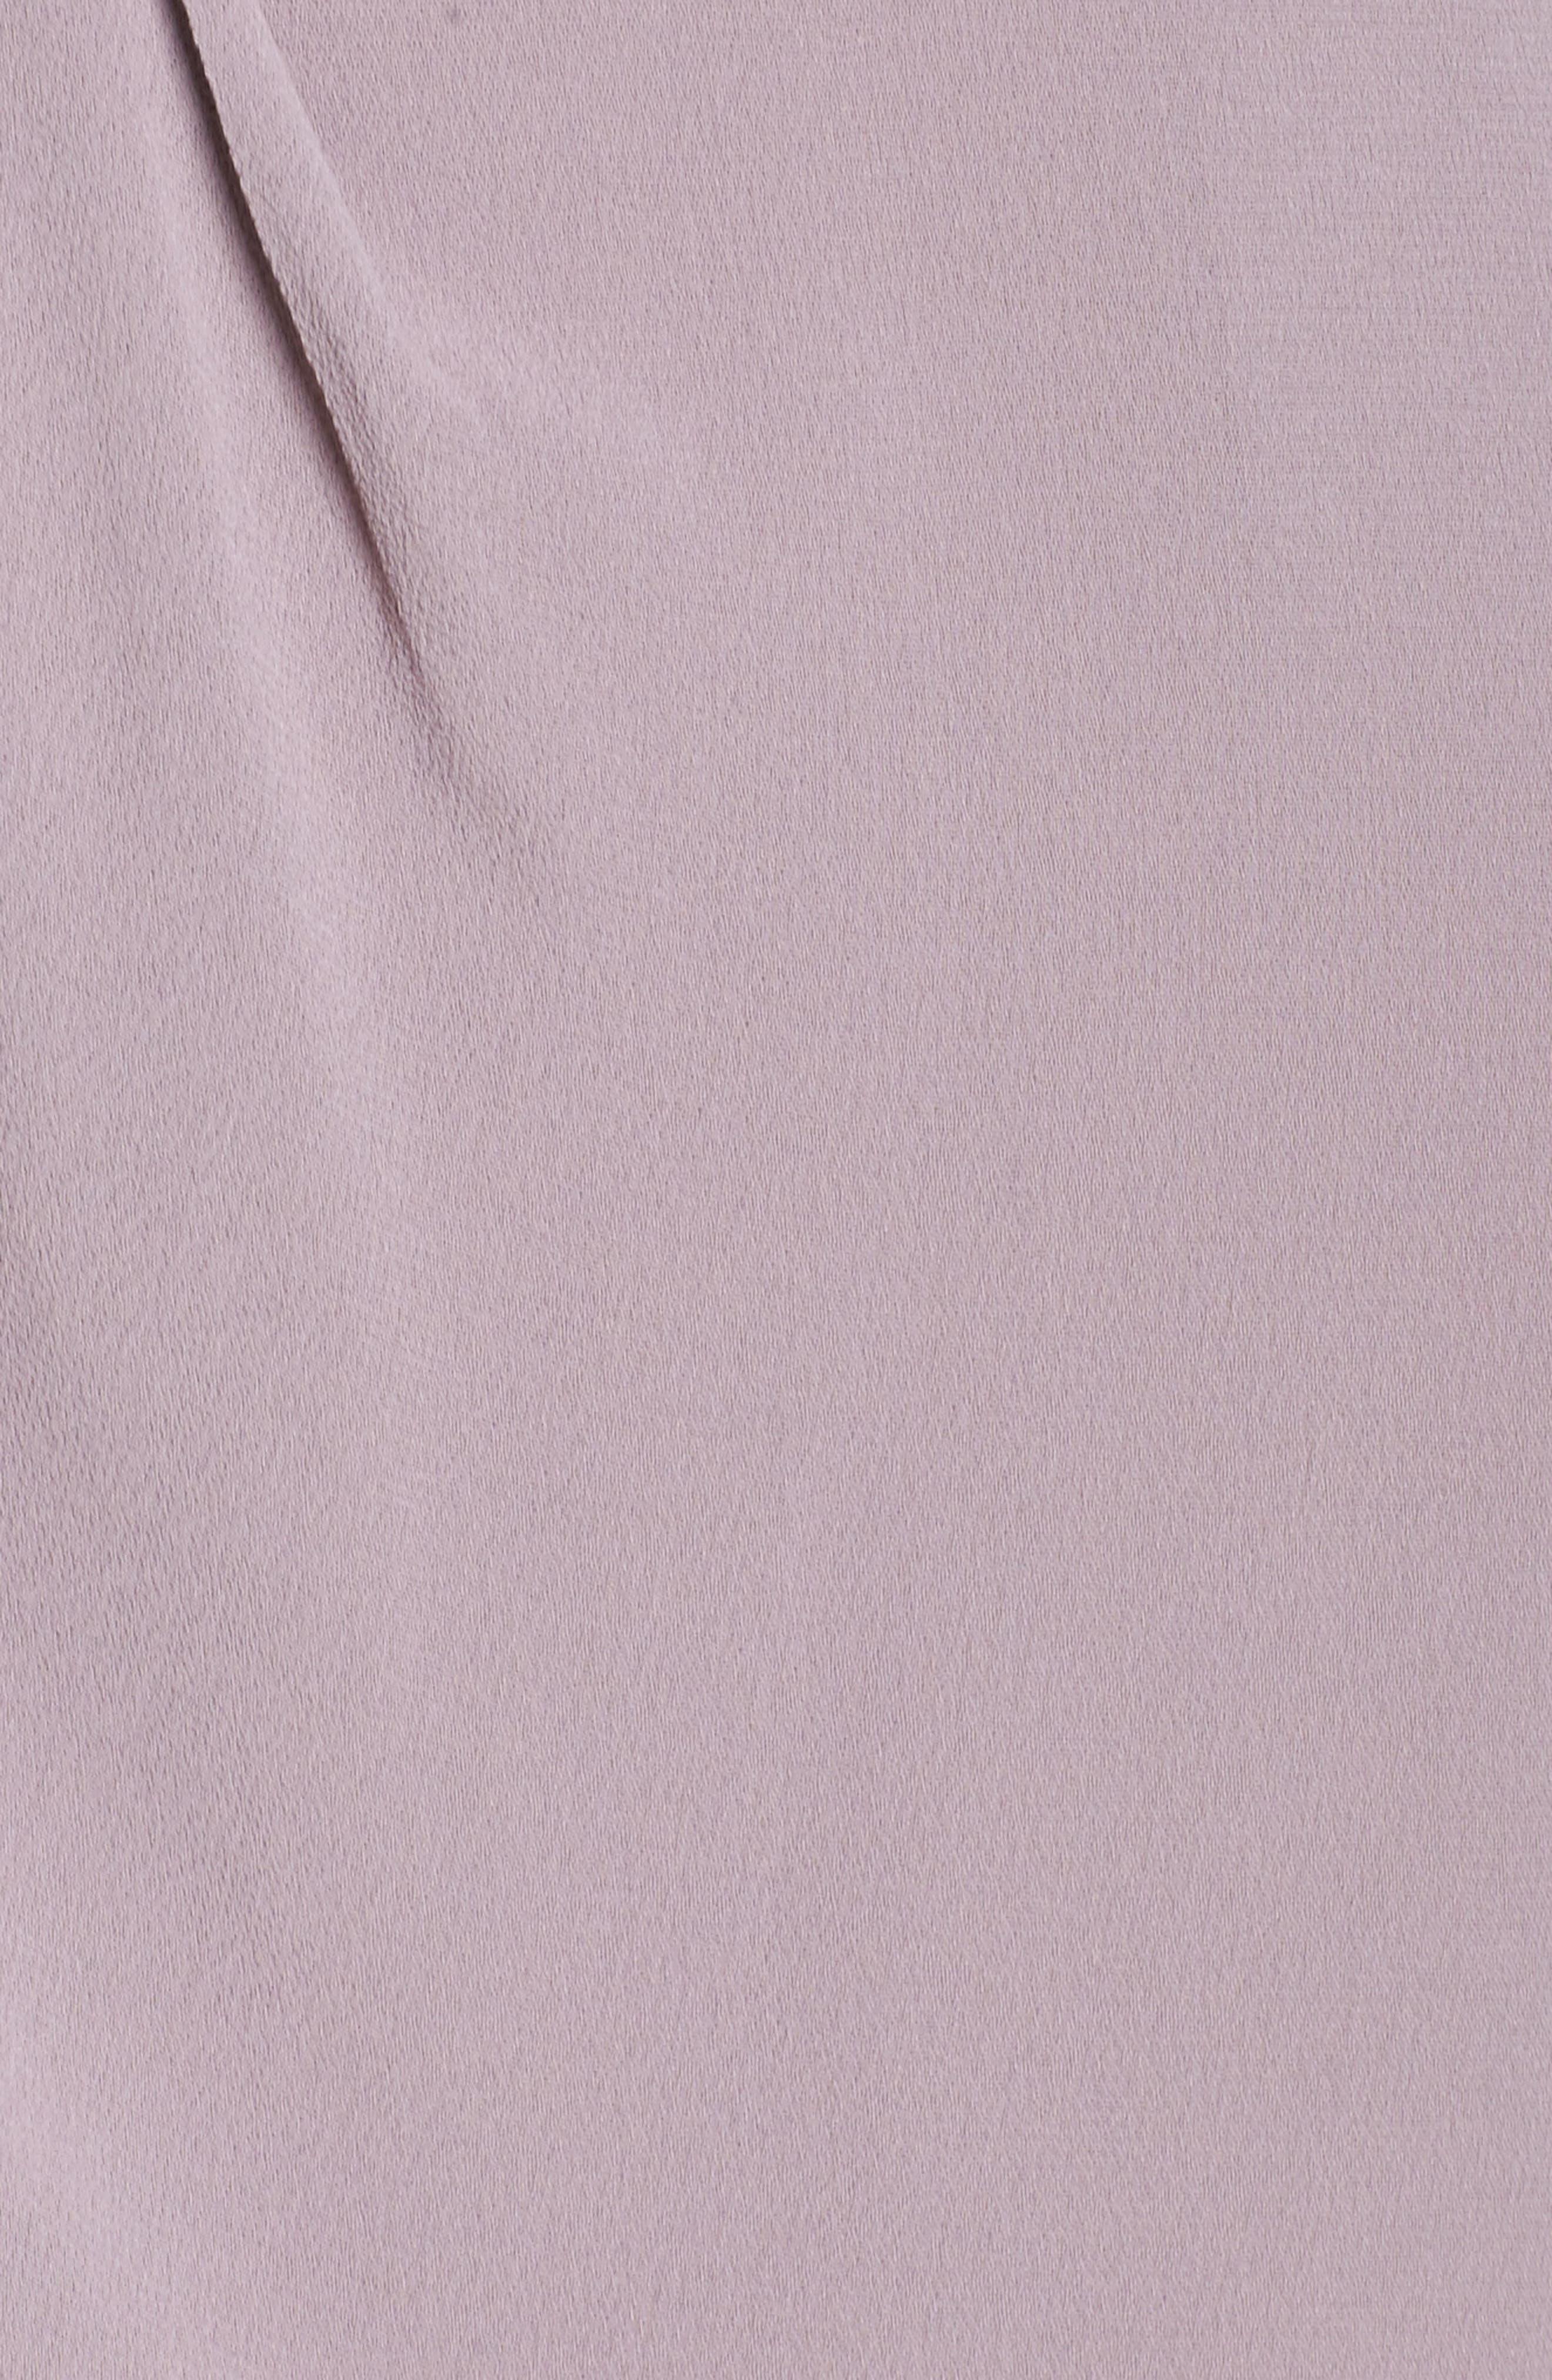 Stilla Asymmetric Drape Dress,                             Alternate thumbnail 5, color,                             535